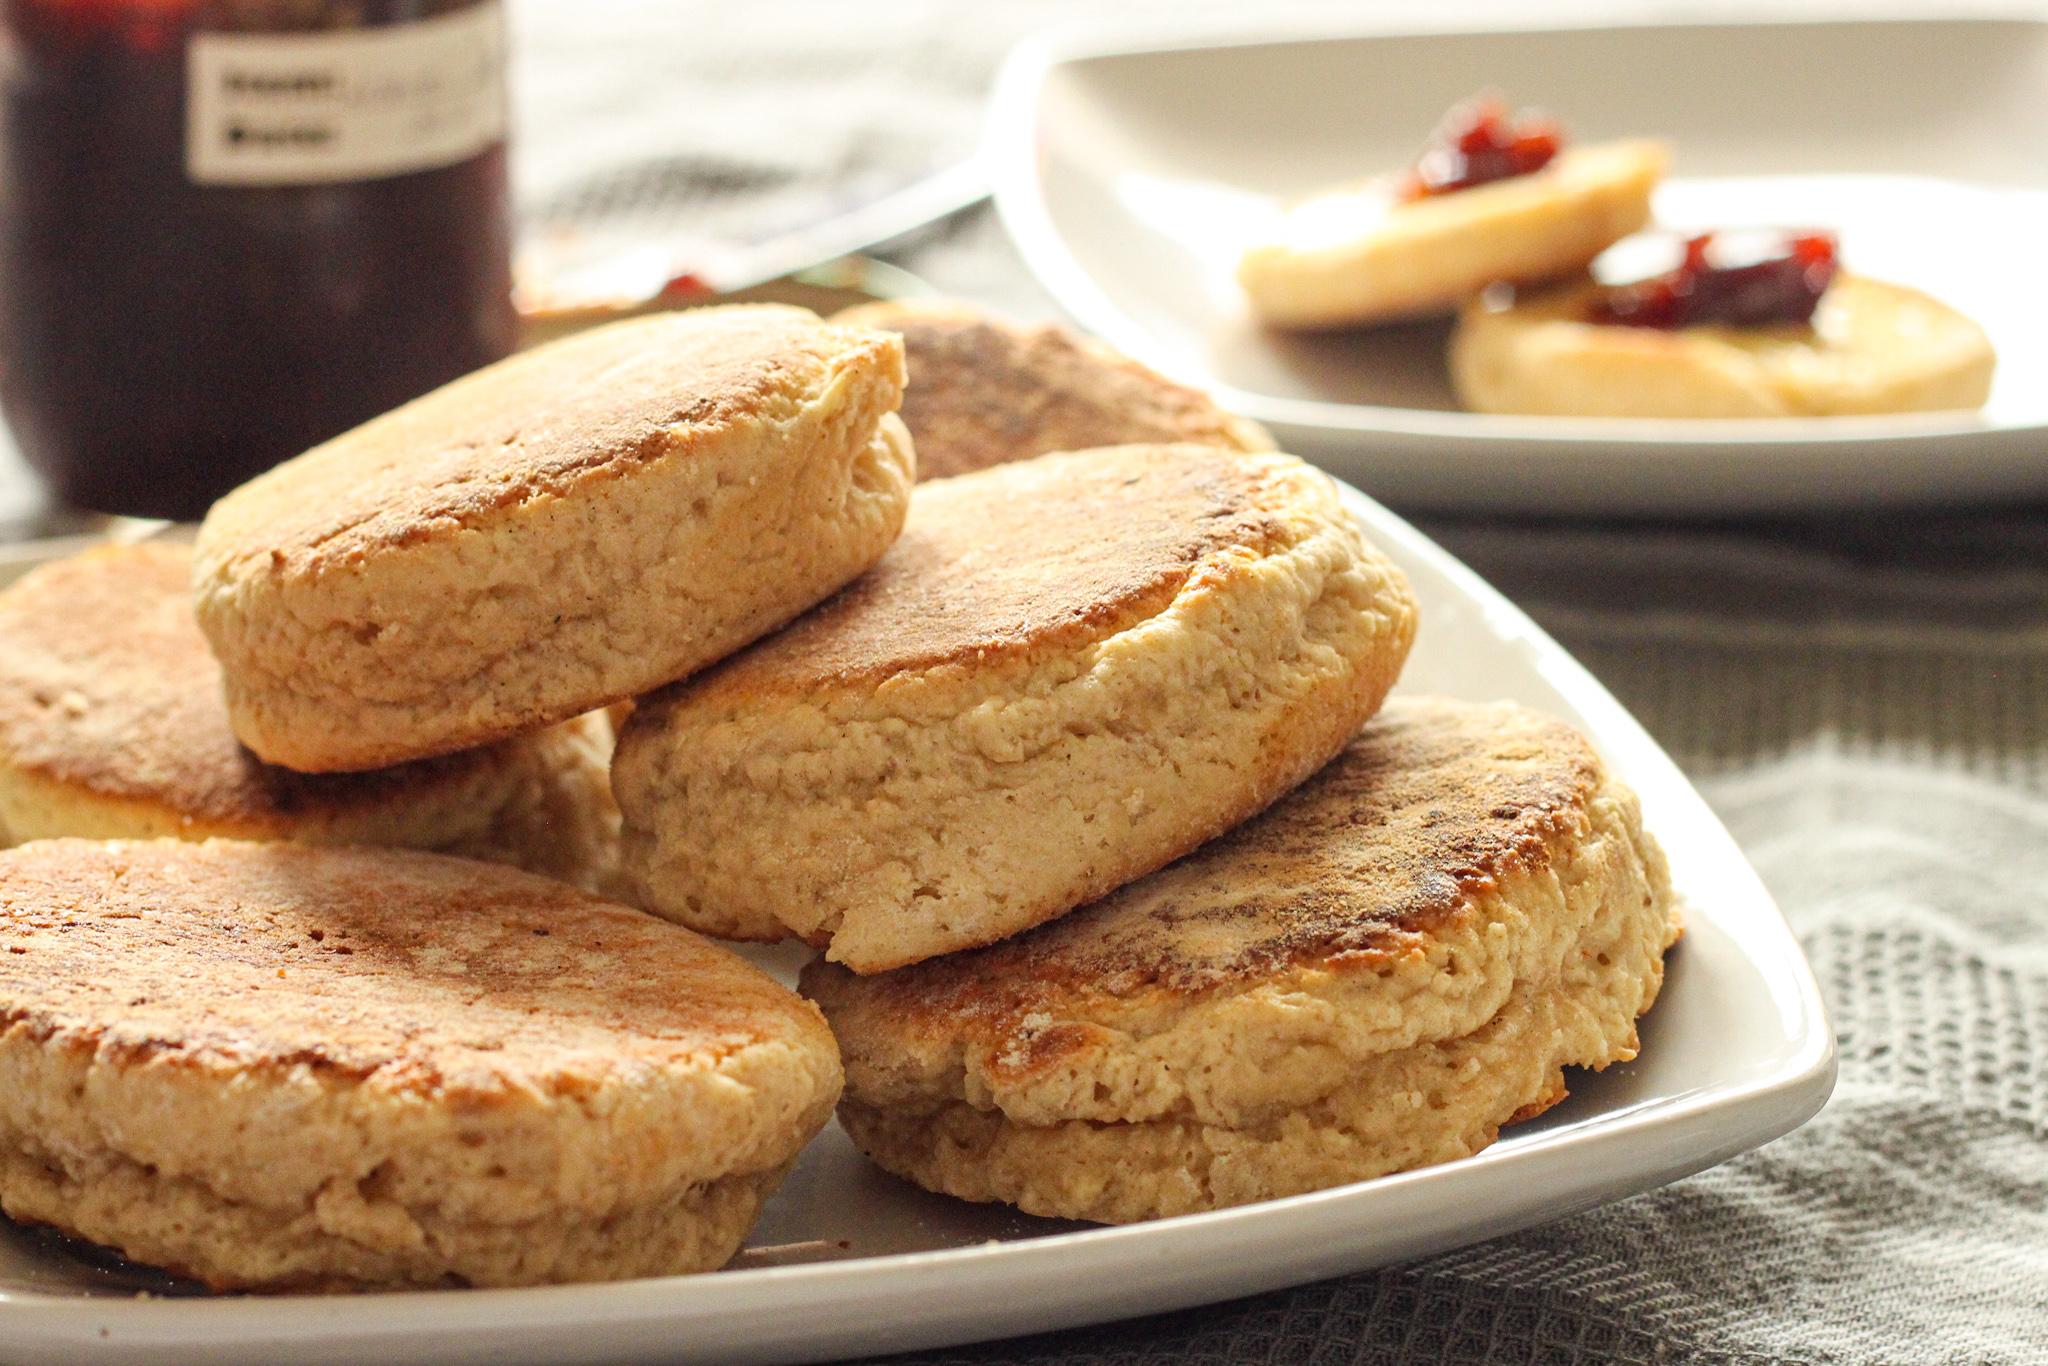 Bermuda Johnny cakes: The Best Quick Bermuda Breakfast Bread